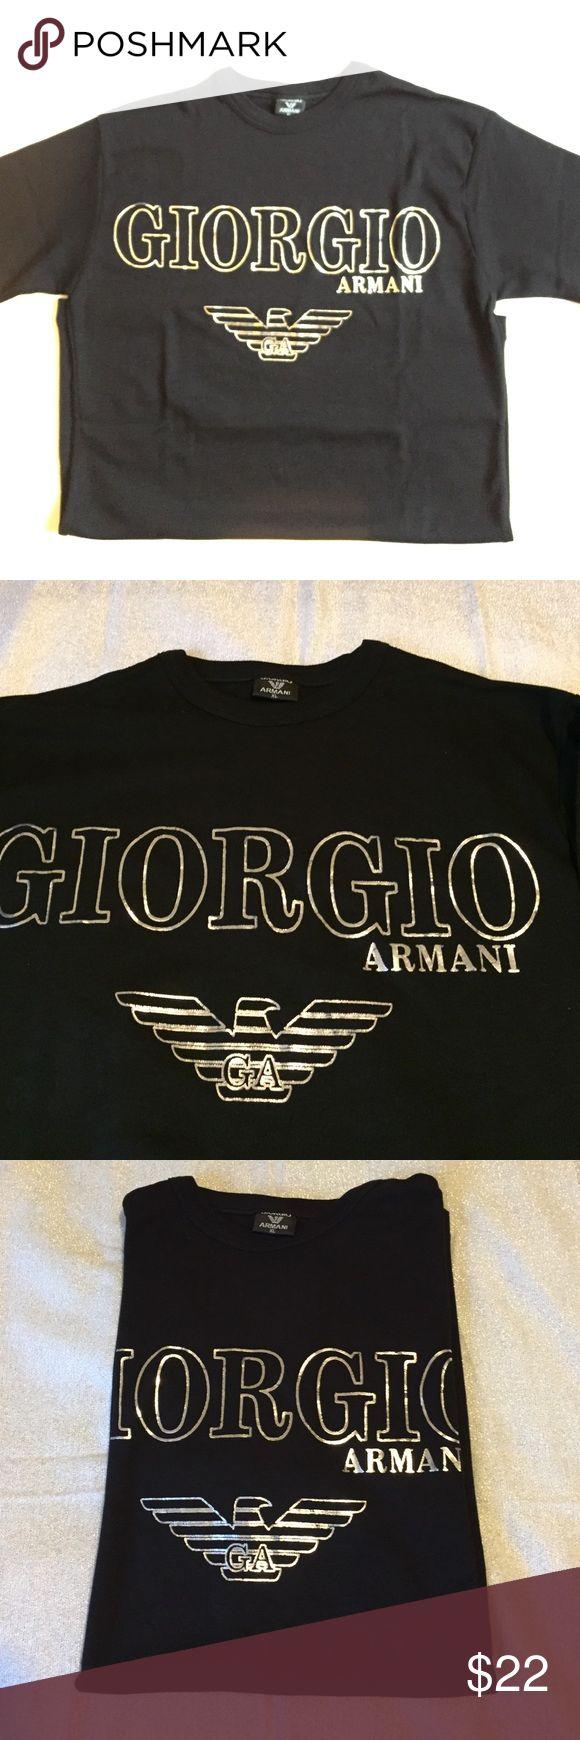 Giorgio Armani T shirt NWOT Giorgio Armani black T shirt  with silver 100% cotton made in Turkey size xl but better fits M-L Giorgio Armani Shirts Tees - Short Sleeve